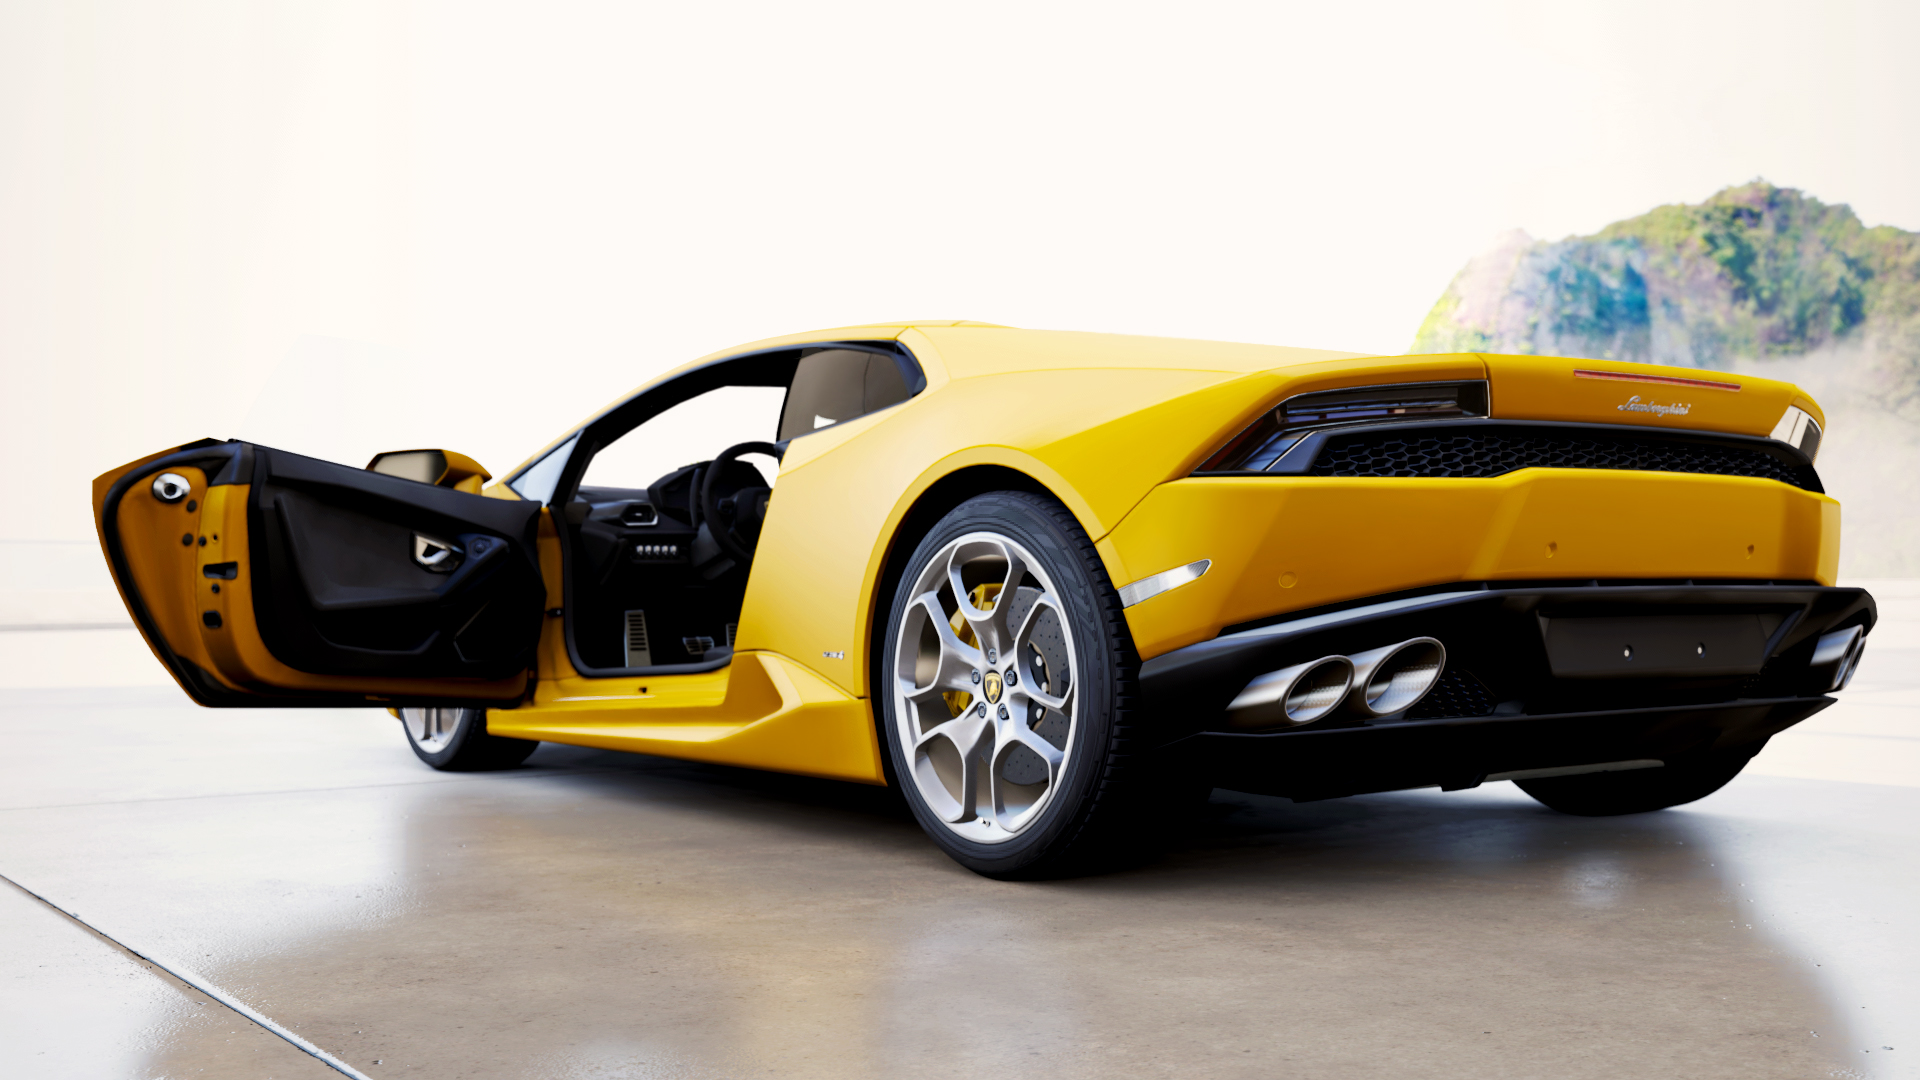 El clásico Lamborghini amarillo - 1920x1080